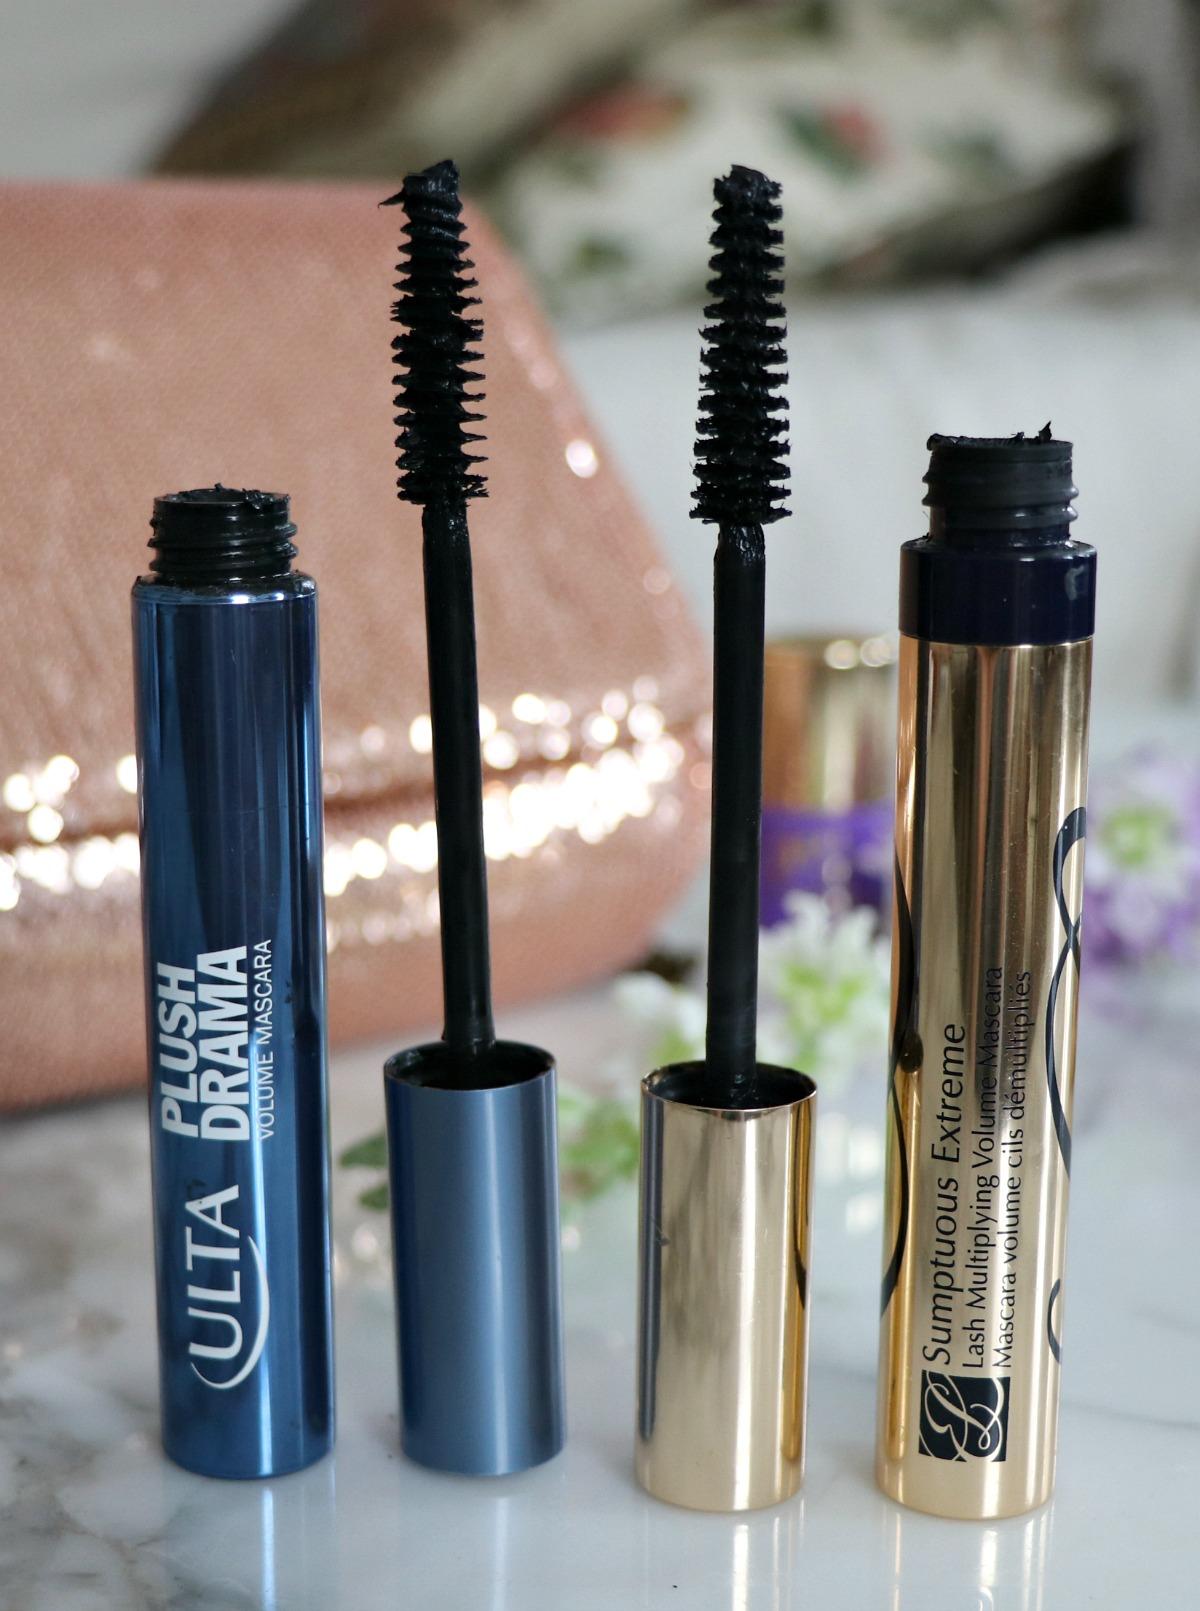 ULTA Mascara Dupe for Estee Lauder Sumptuous Extreme